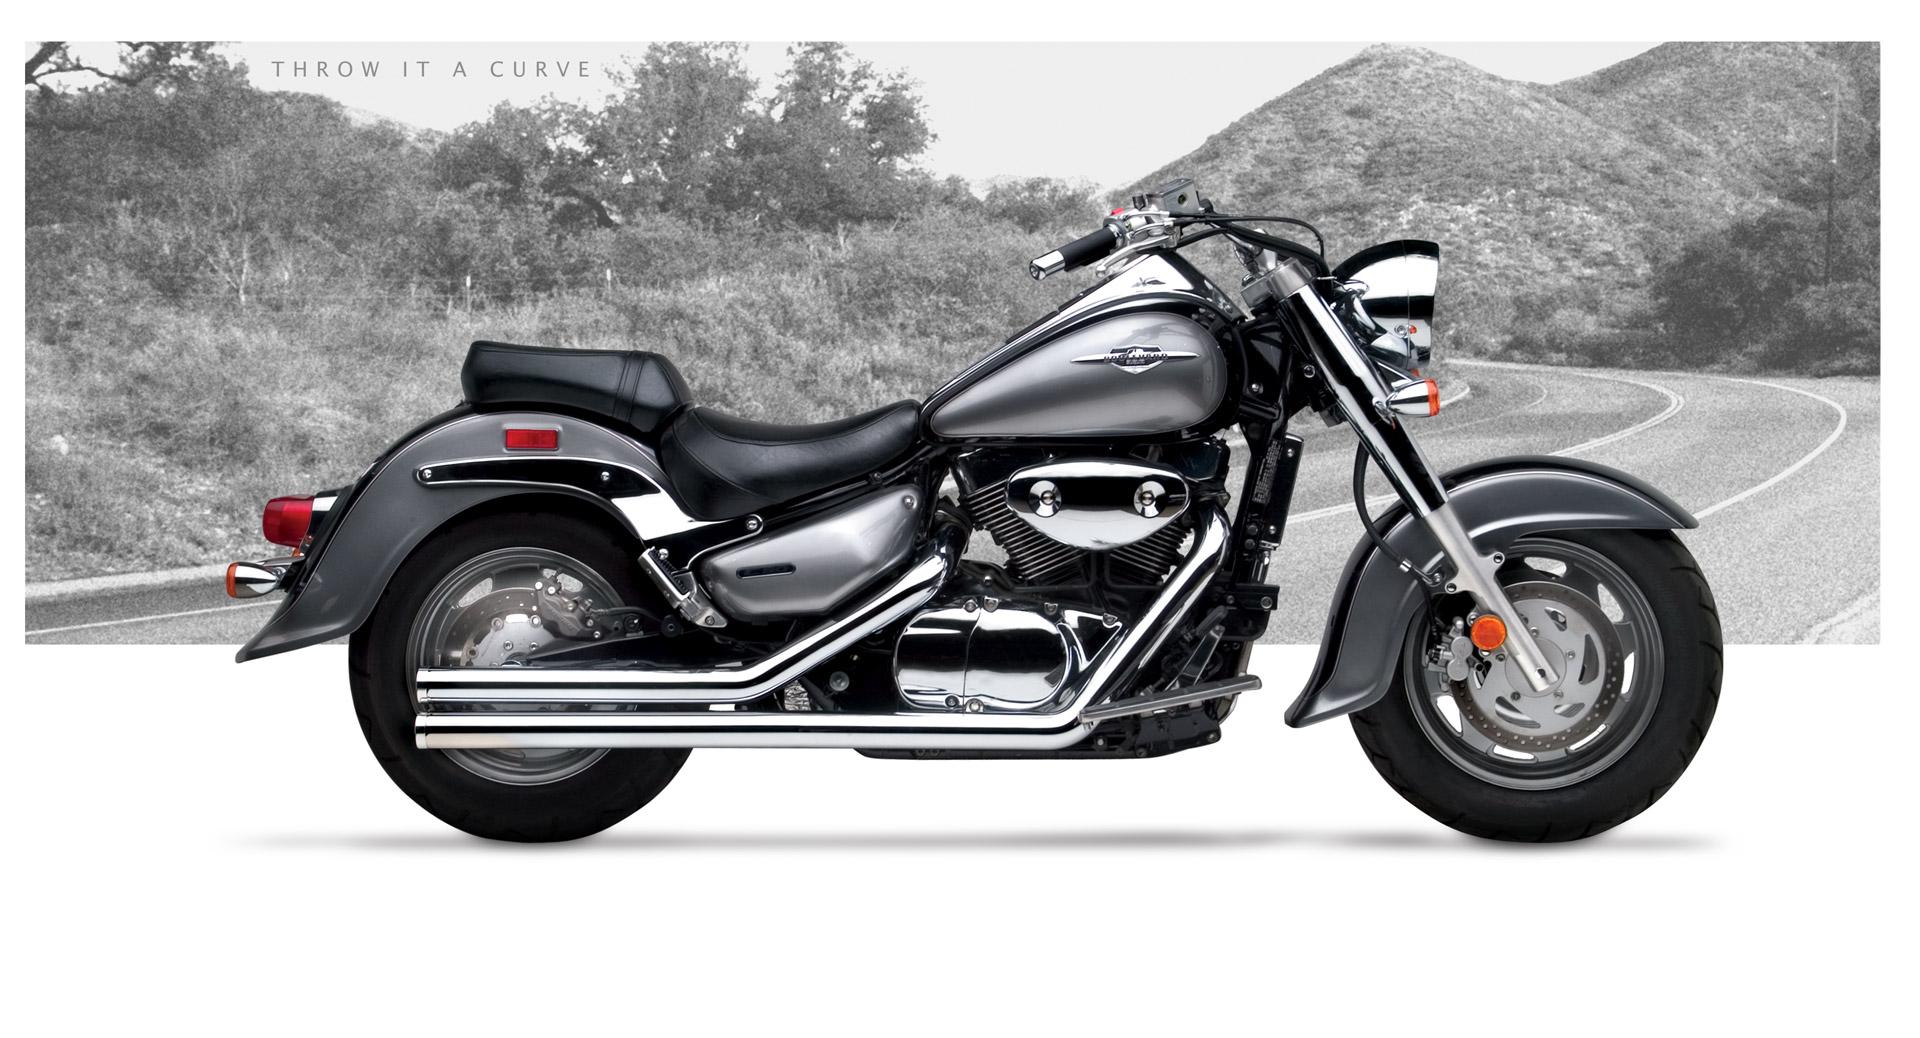 suzuki intruder vl1500 motorcycle exhaust american classic ii 1998 Suzuki VL1500 suzuki intruder vl1500 1998 04 hard krome american classic ii